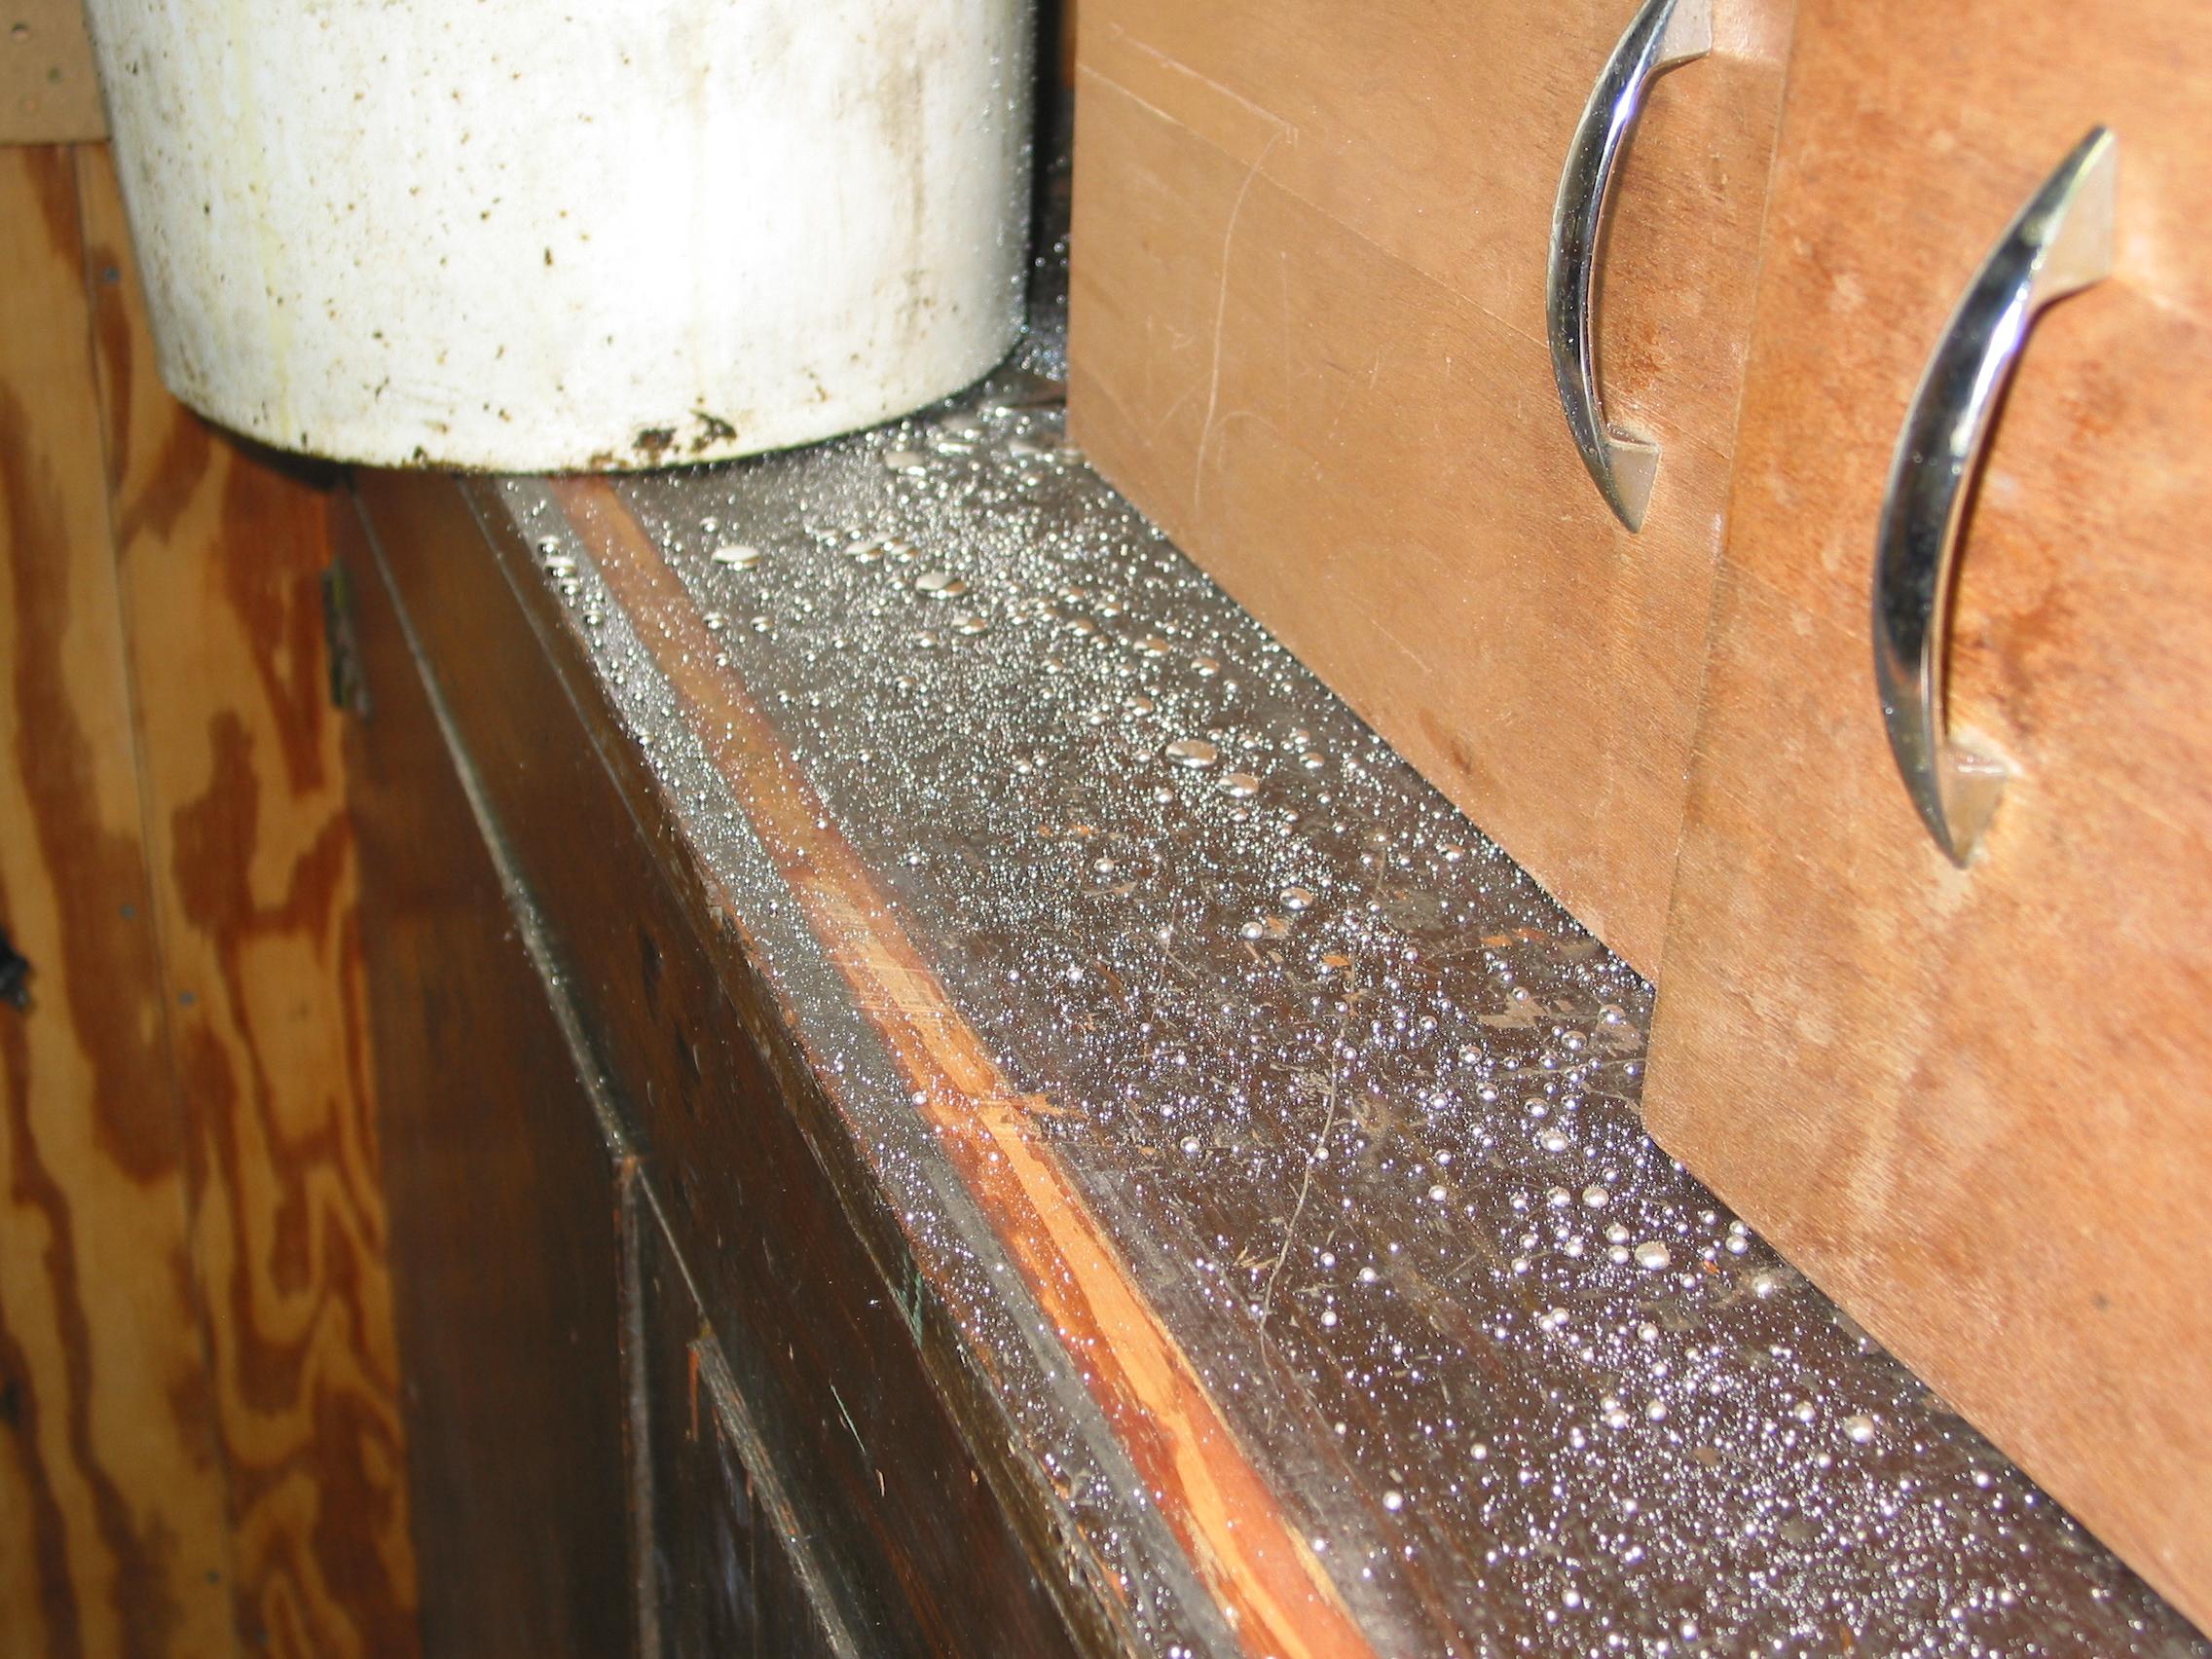 Union mercury spill 002.jpg